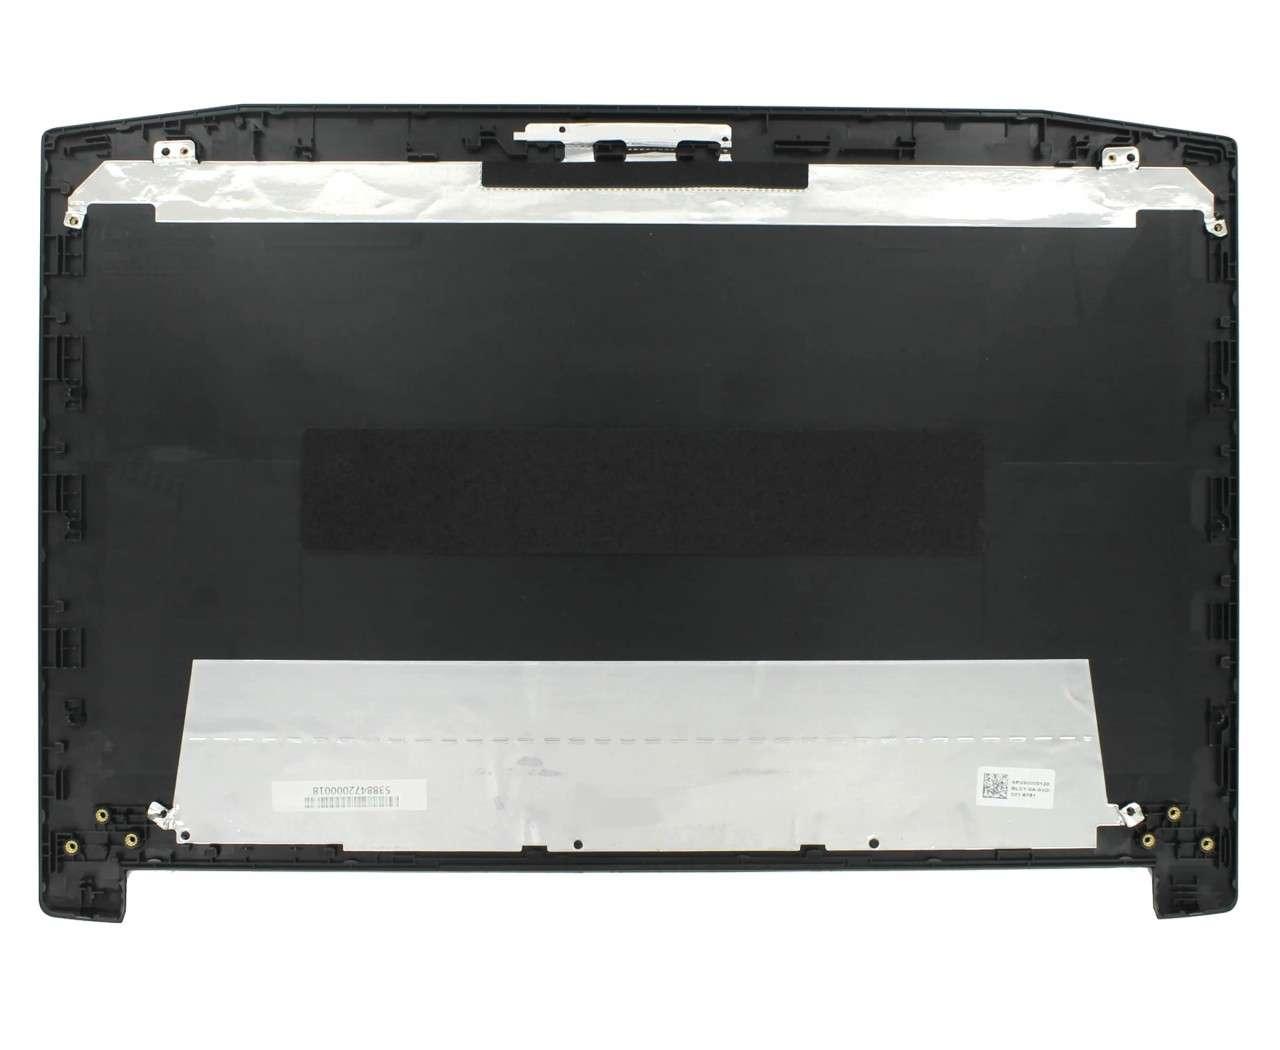 Capac Display BackCover Acer Nitro 5 AN515-52 Carcasa Display imagine powerlaptop.ro 2021